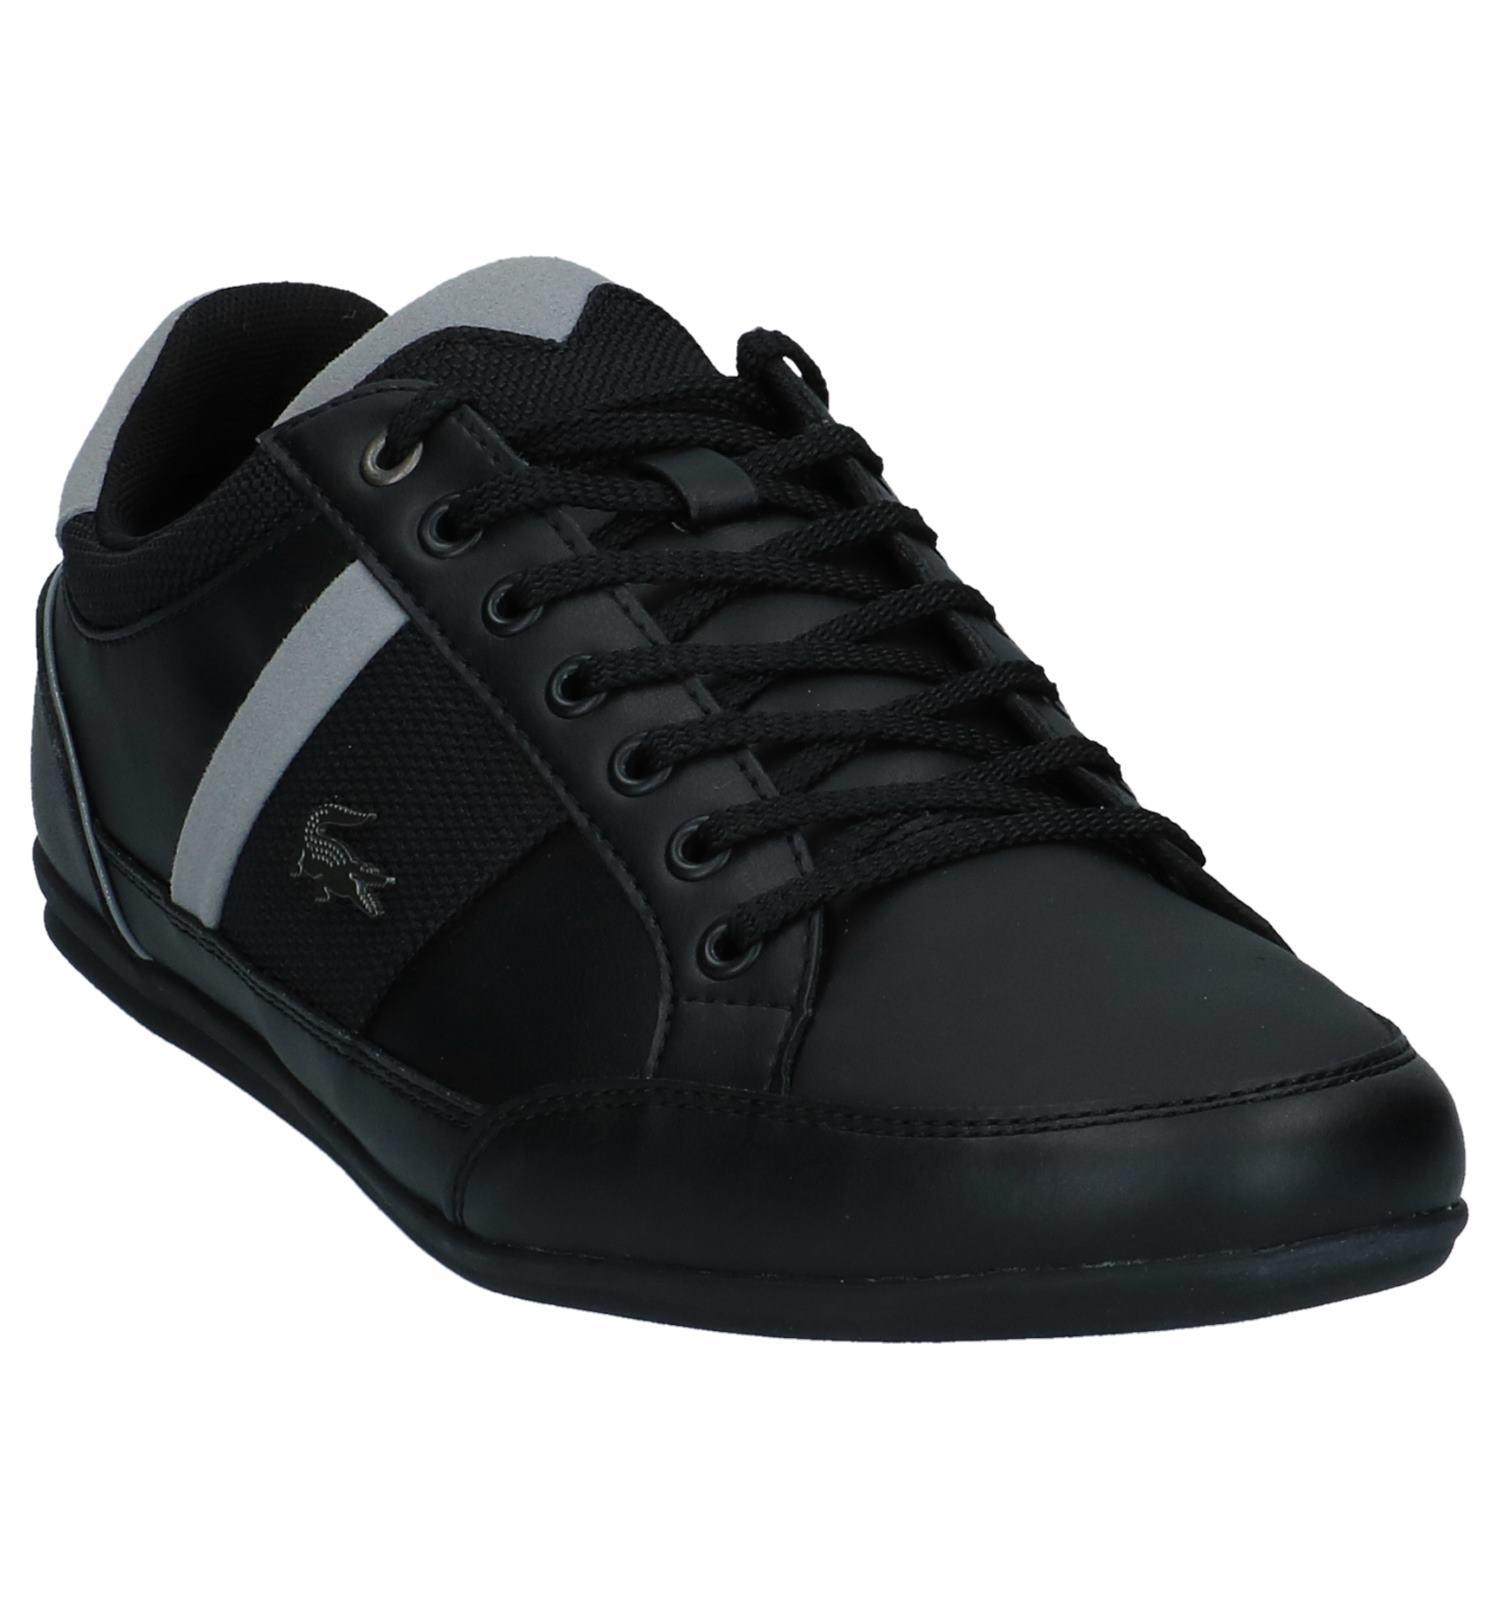 Schoenen Chaymon Casual Chaymon Lacoste Casual Zwarte Zwarte Lacoste Lacoste Schoenen WEIeDH29Y